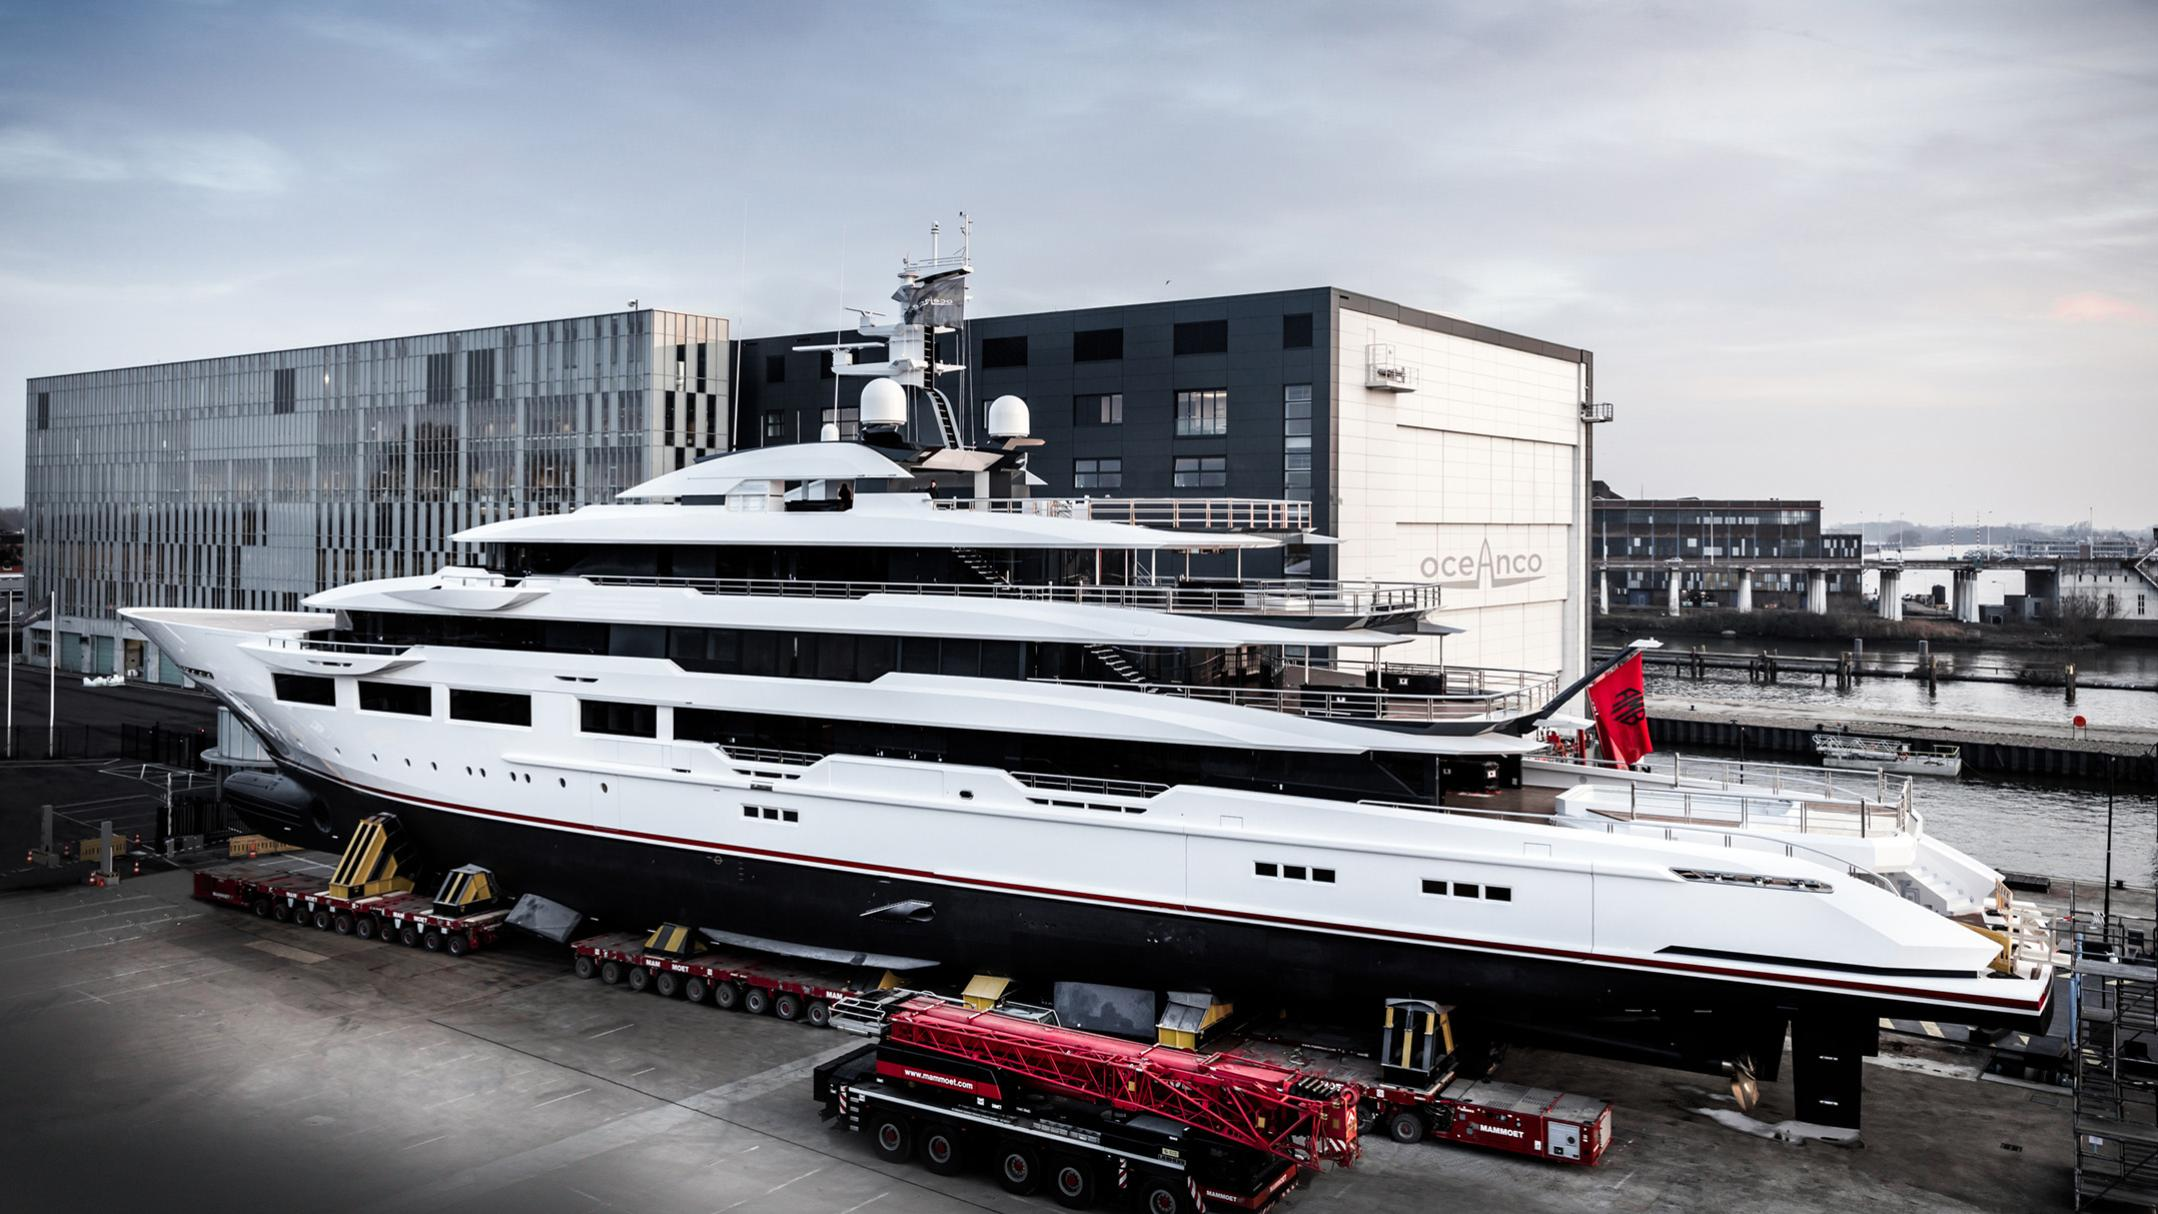 dreamboat y716 motoryacht oceanco 90m 2019 launch half stern